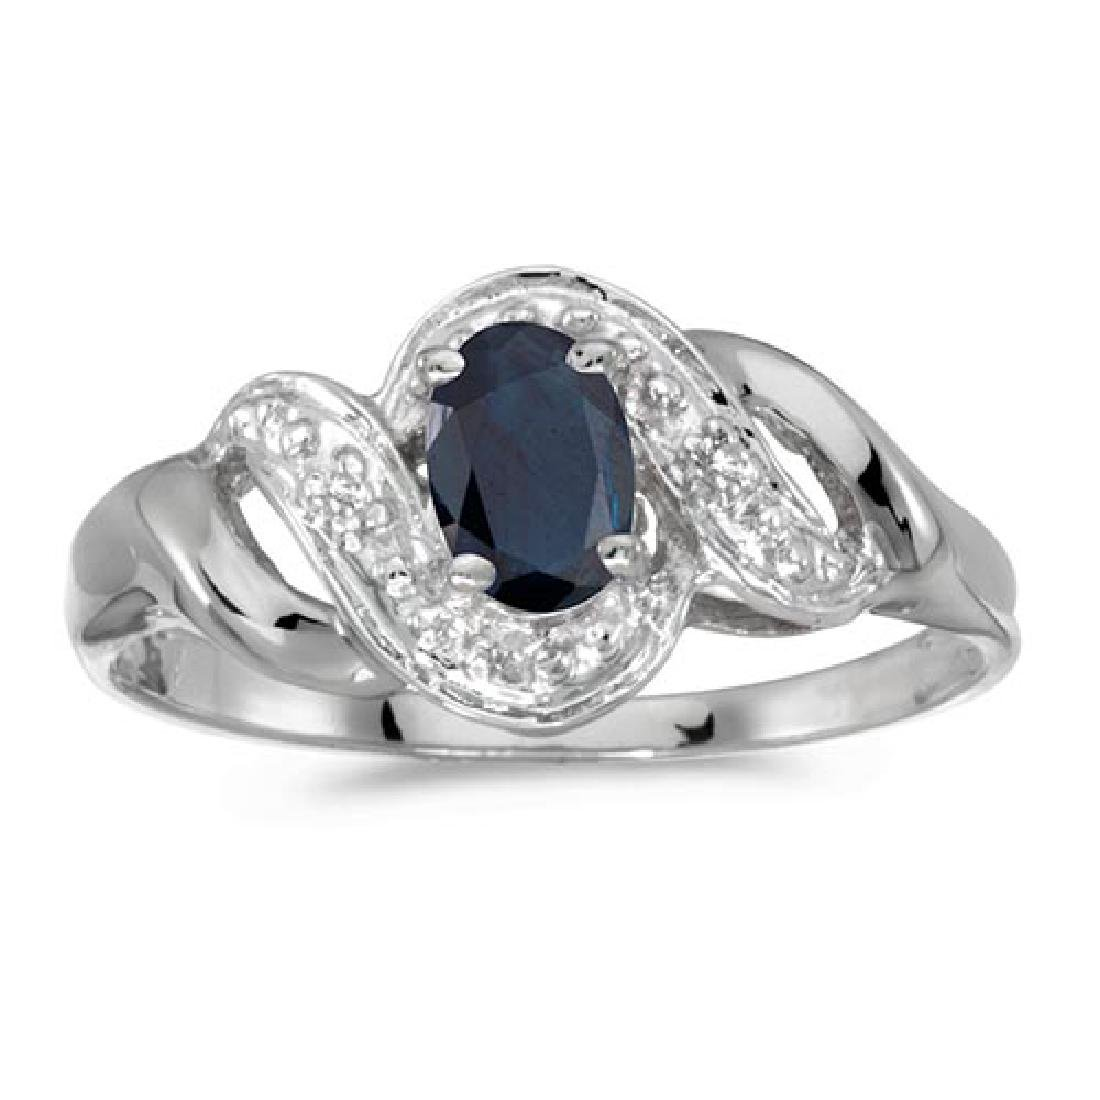 Certified 14k White Gold Oval Sapphire And Diamond Swir